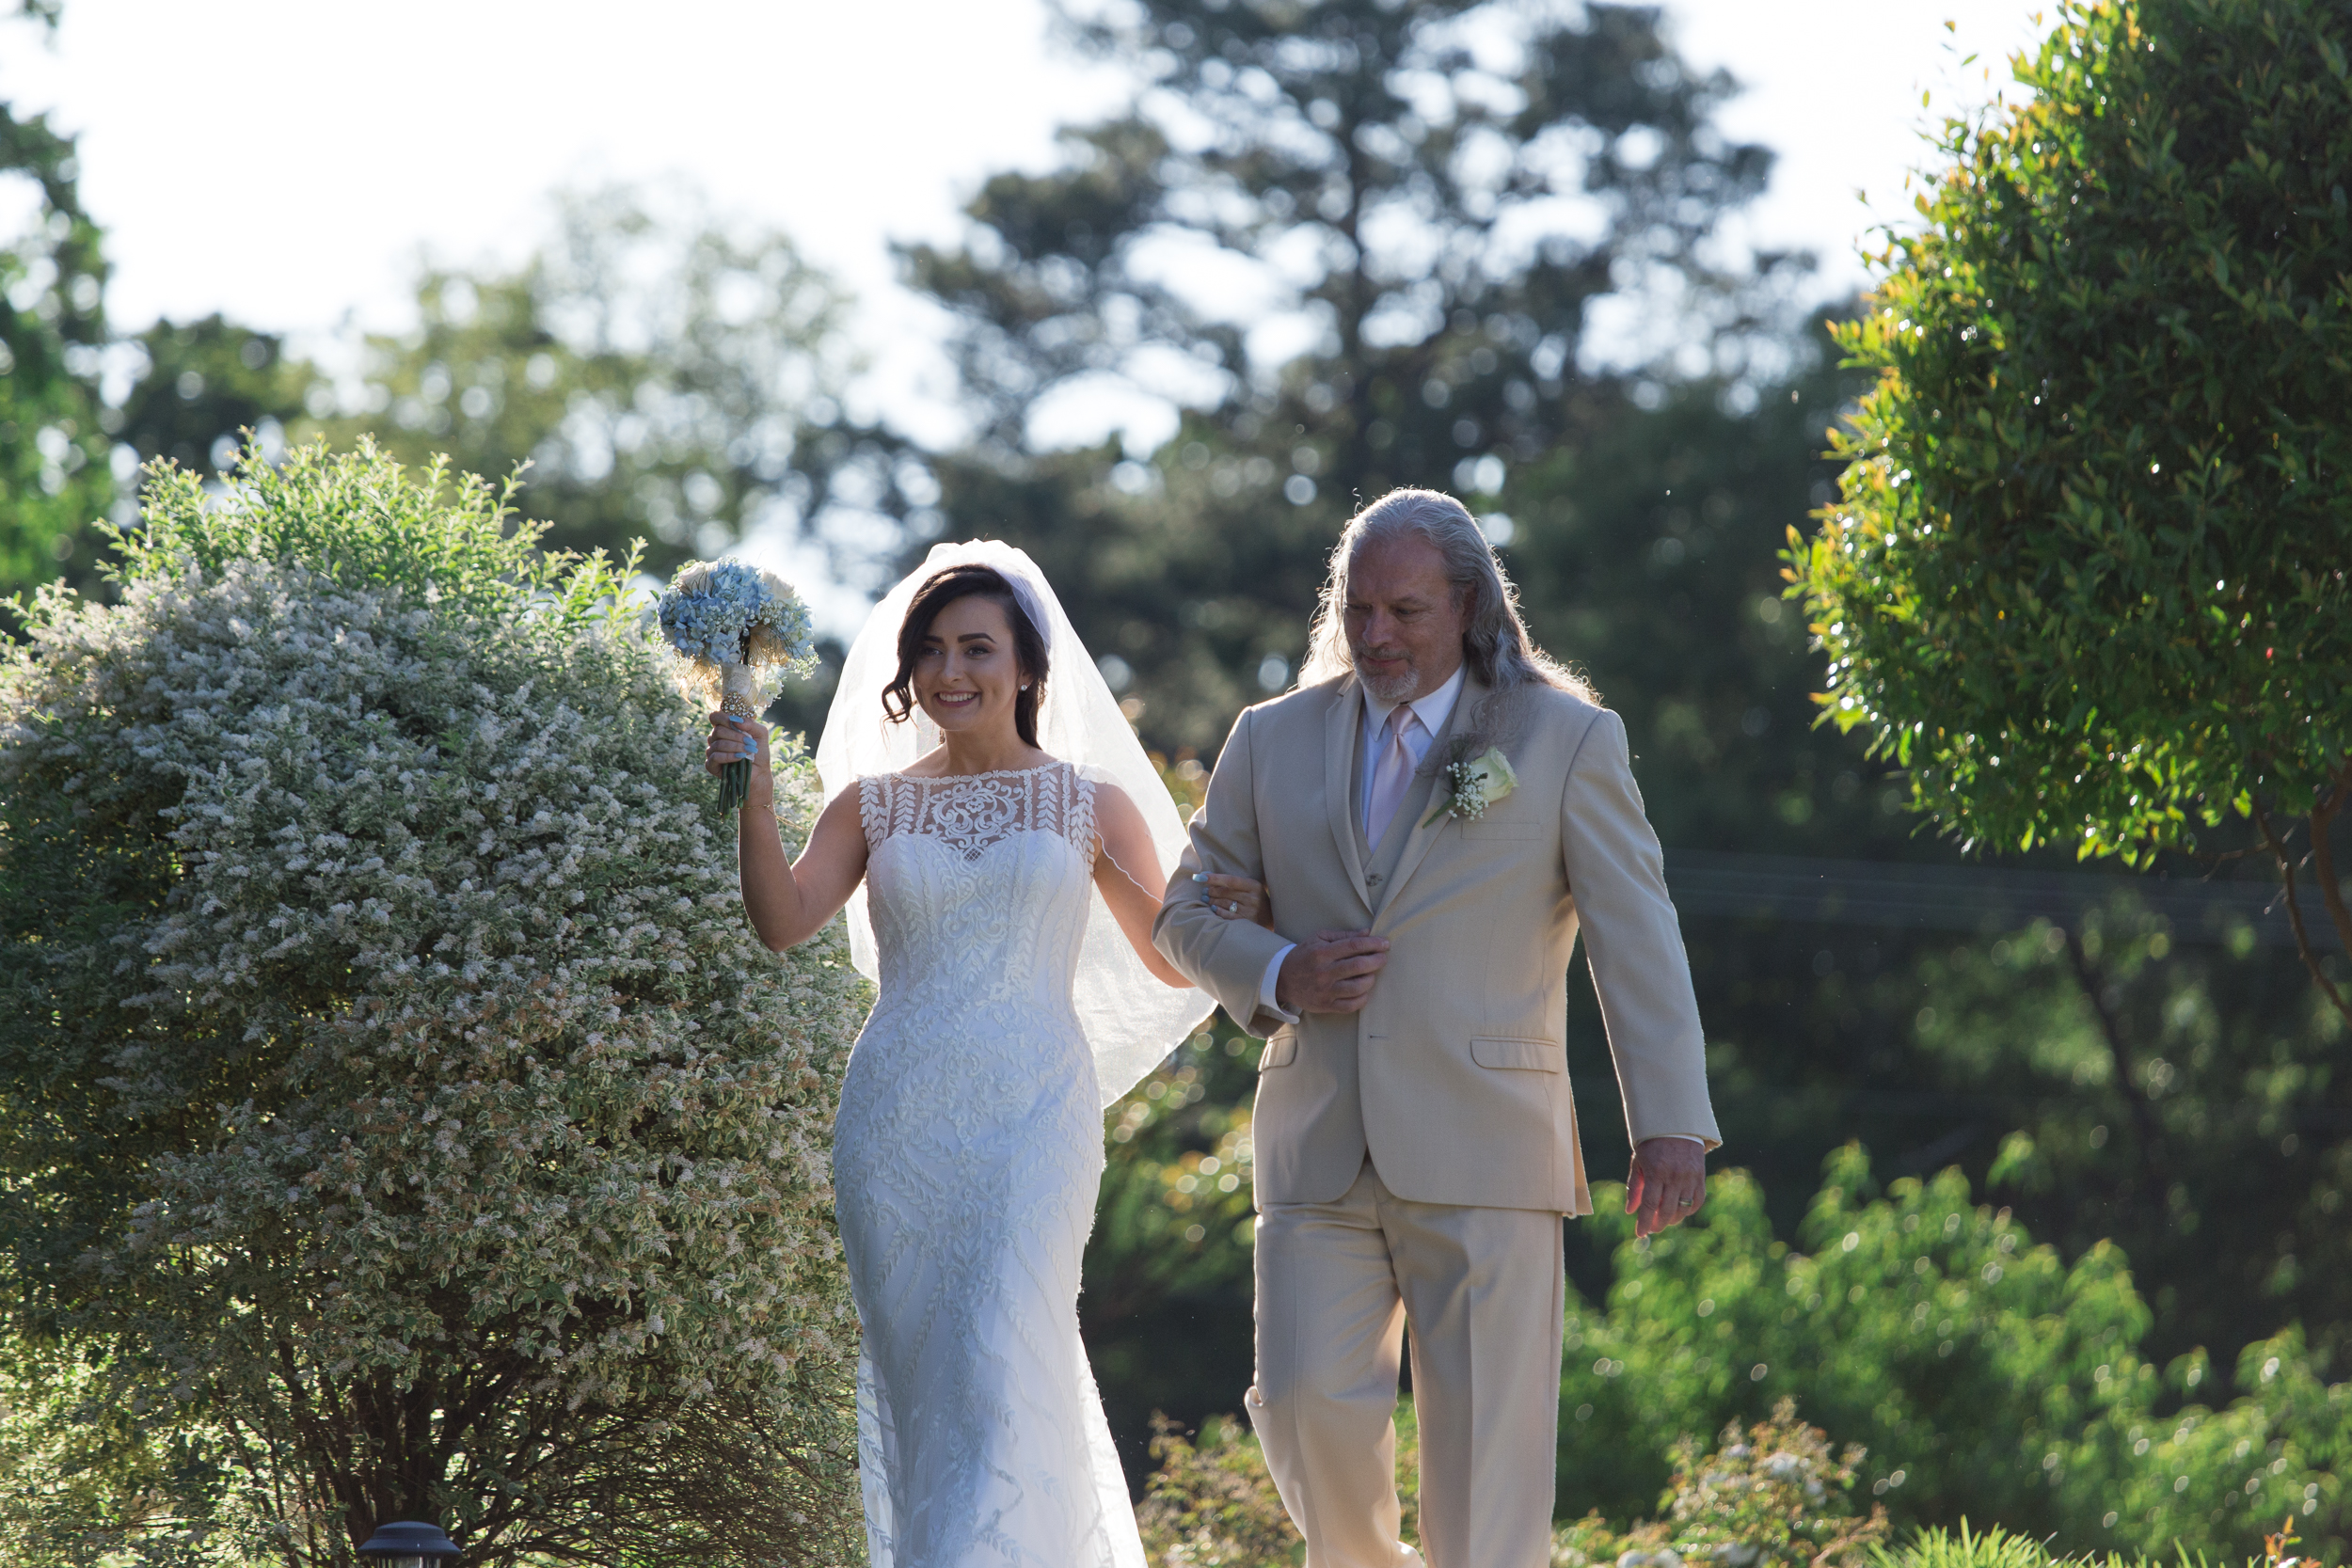 Zihlman-East TX Wedding_Kelsie Hendricks Photography_The Folmar Tyler Texas-33.jpg